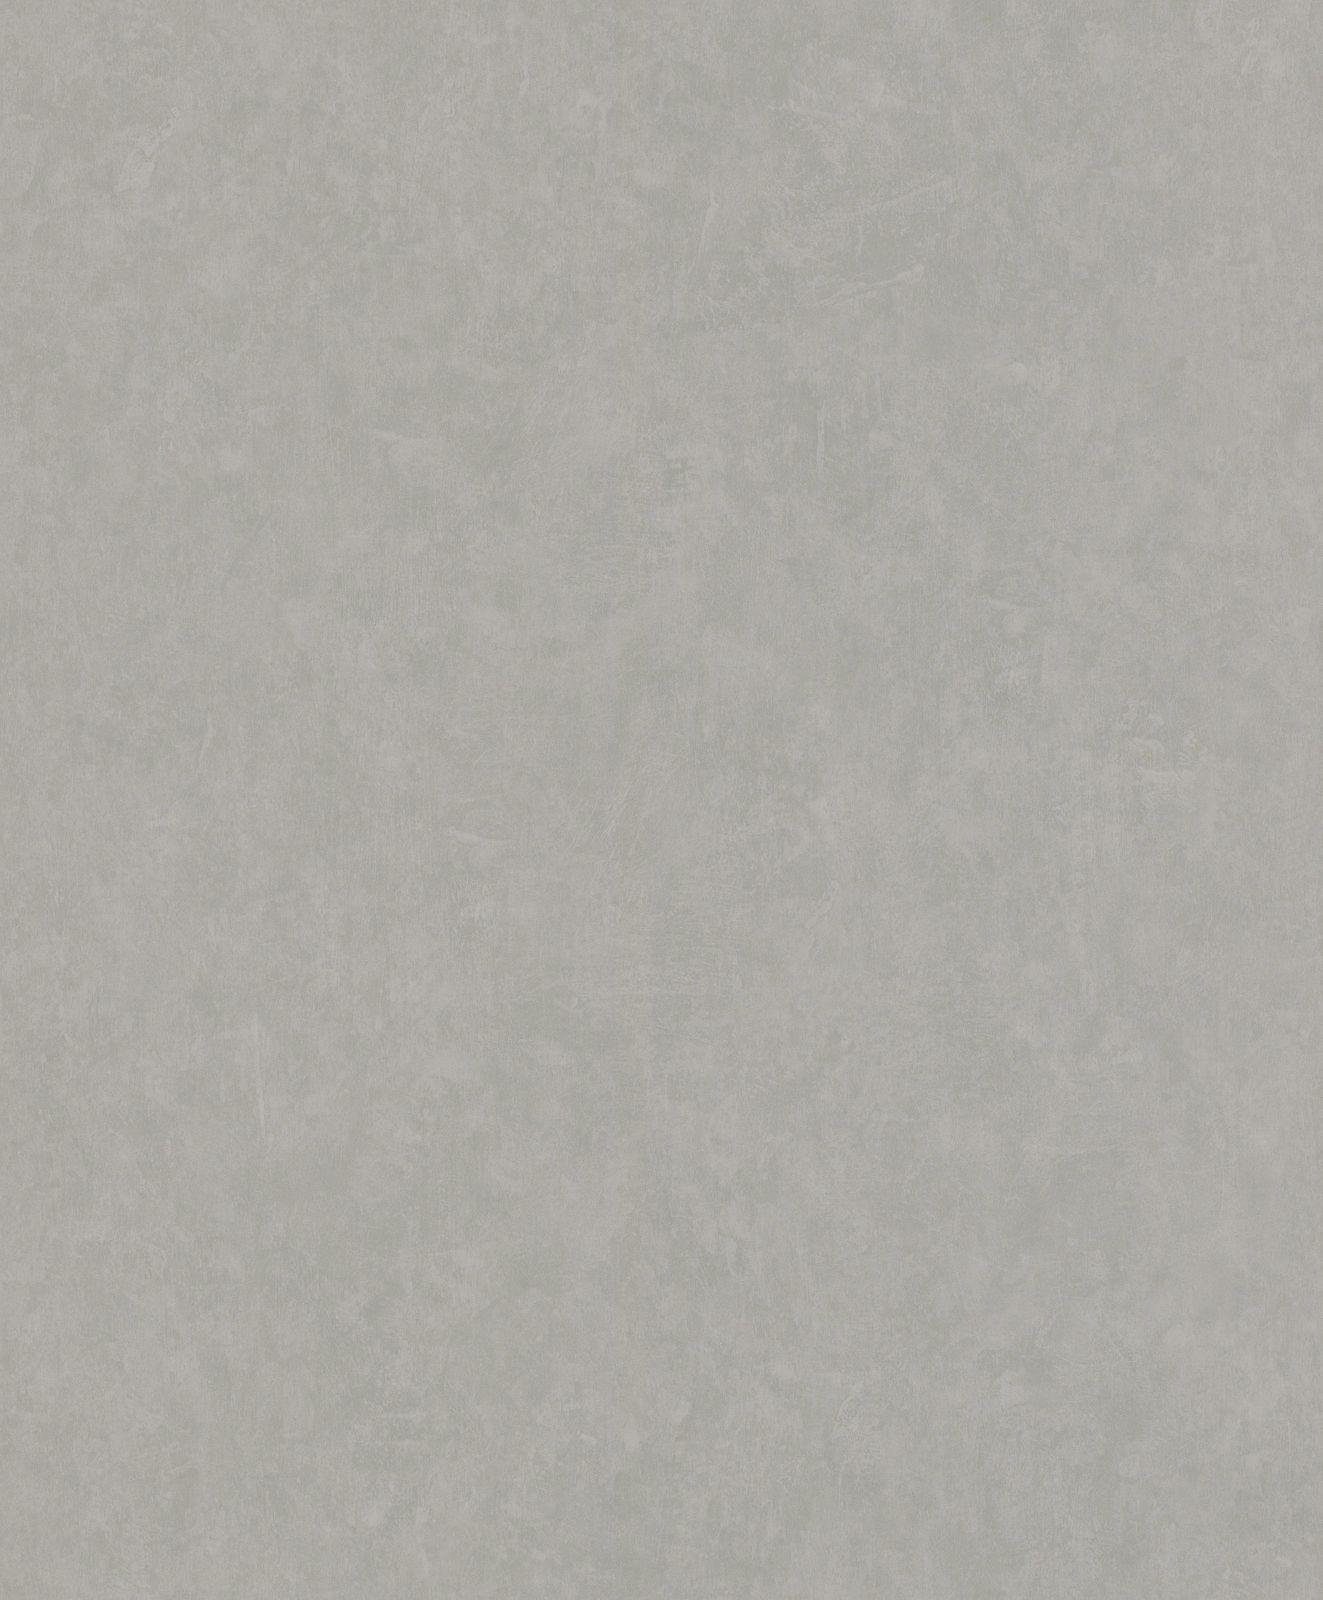 Full Size of Alpina Betonoptik Beton Optik Hellgrau Farbrezepte Effektfarbe Beton Optik Komplett Set Bauhaus Feine Farben Obi Video Grau Toom Tapete Vlies Design Dunkelgrau Wohnzimmer Alpina Betonoptik